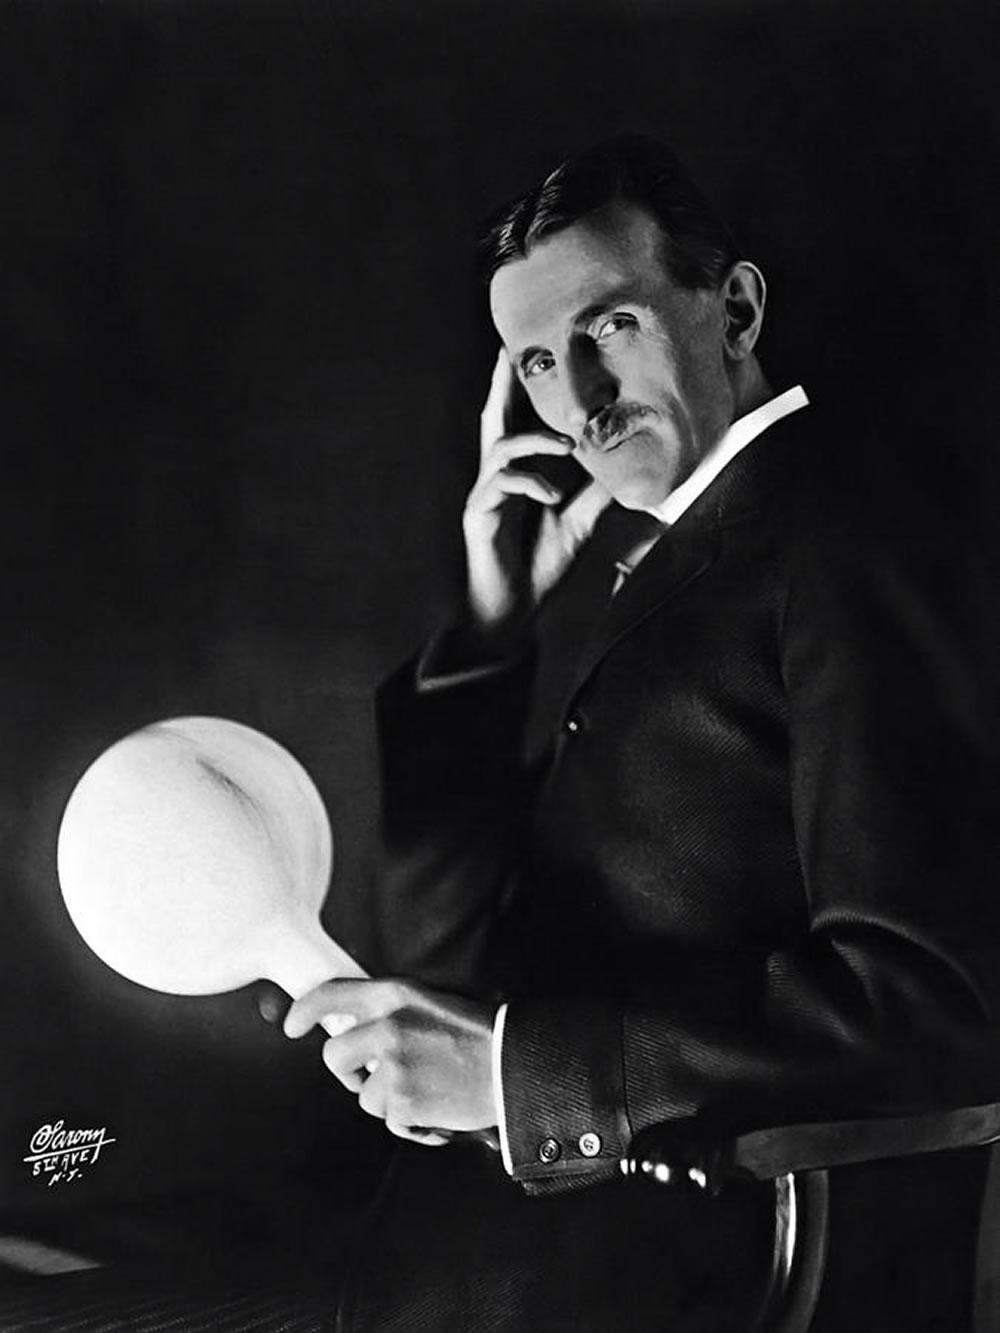 Nikola-Tesla-holding-lightbulb